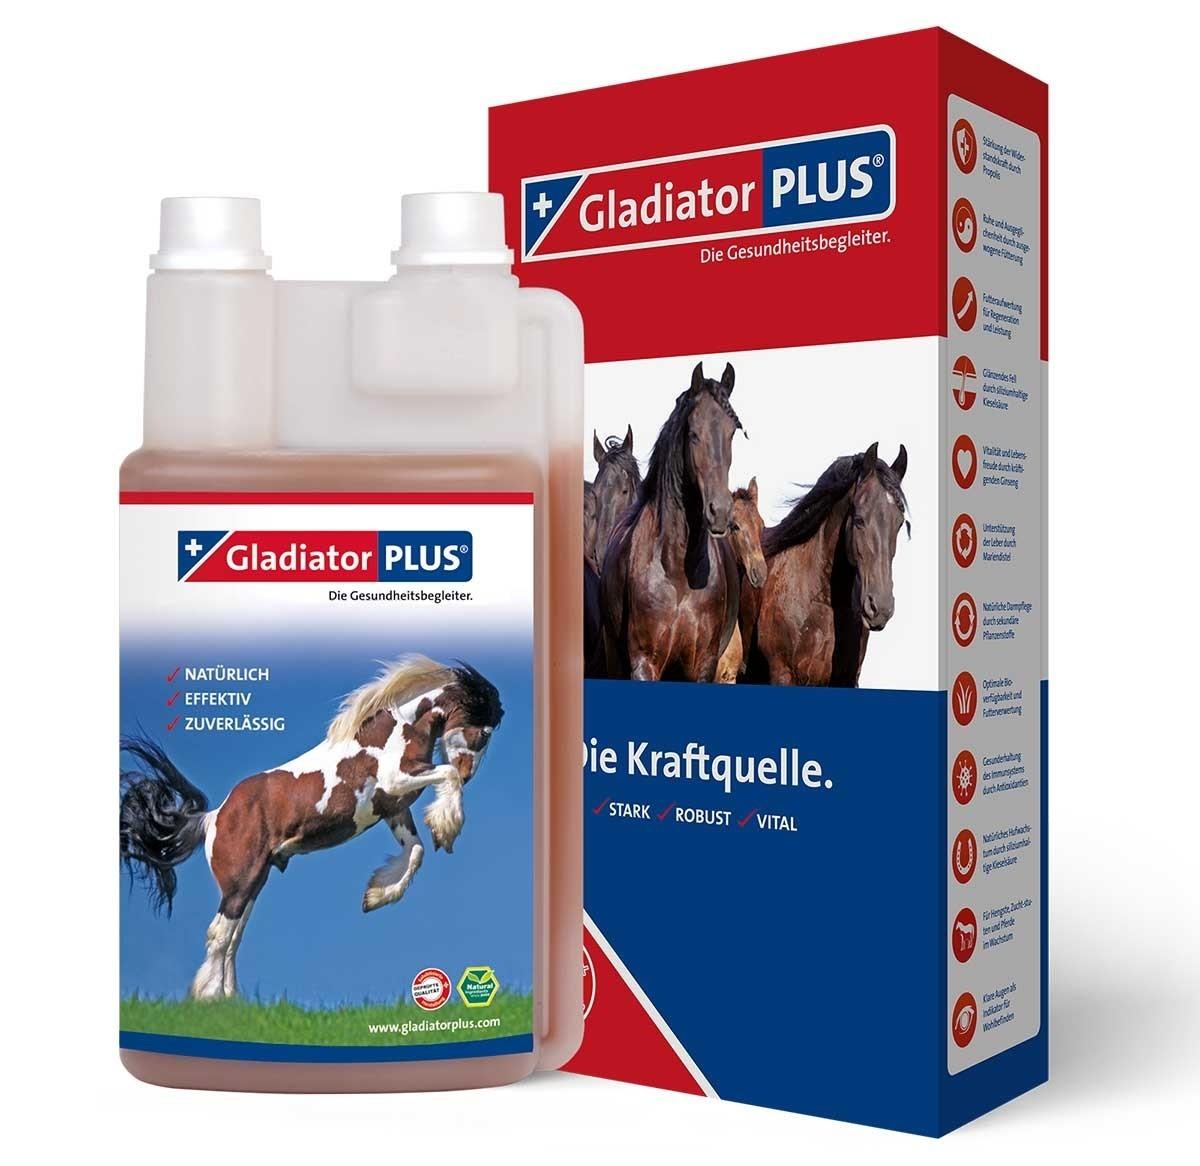 Gladiator Plus 1 L _ Immunsystem 00380